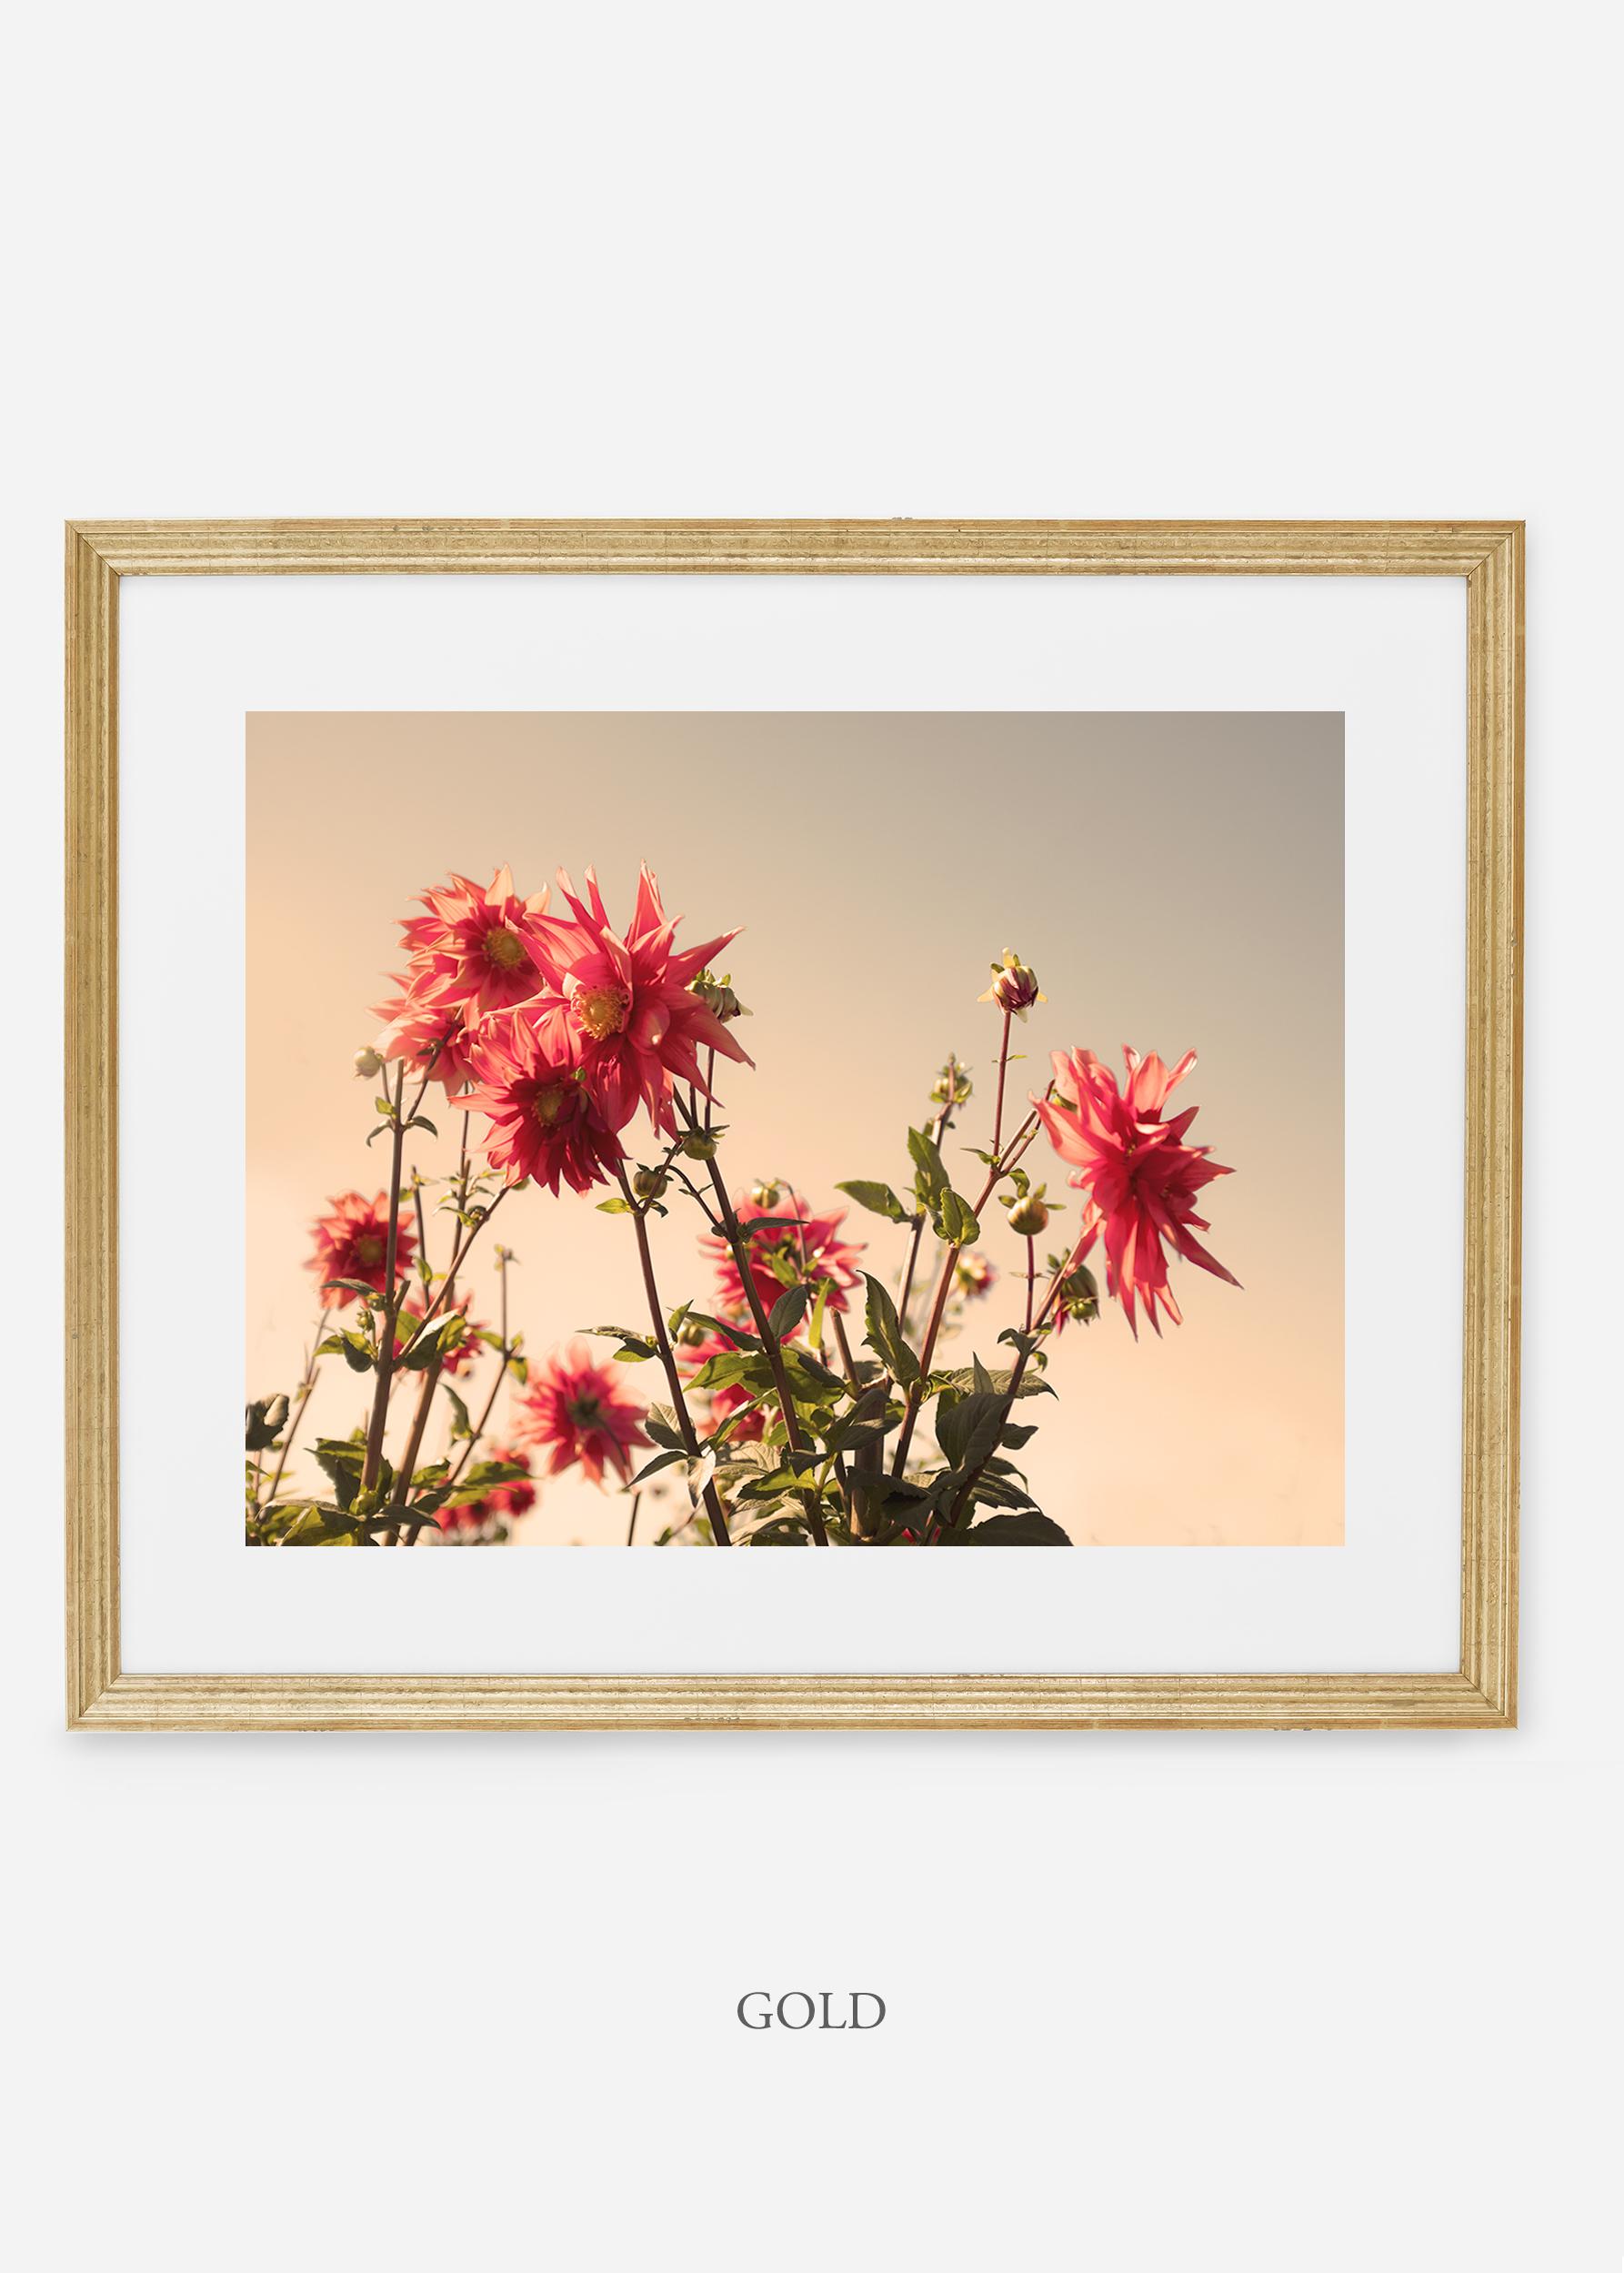 GoldFrame_DahliaNo.9_WilderCalifornia_Art_Floral_Homedecor_Prints_Dahlia_Botanical_Artwork_Interiordesign.jpg